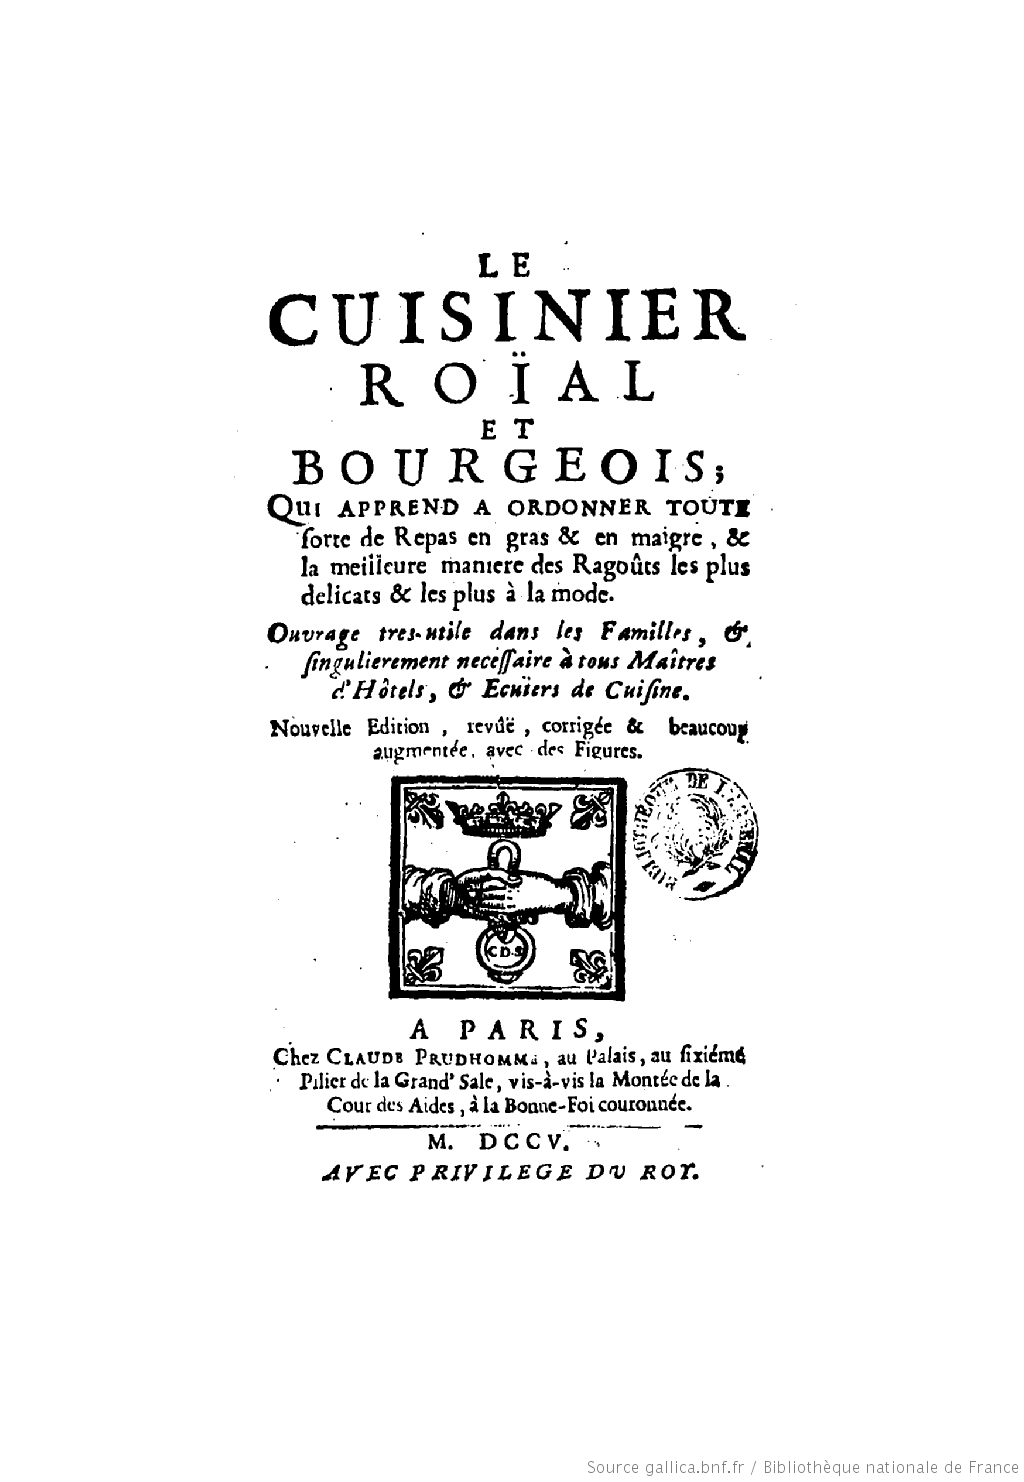 massialot-cuisinier-roial-bourgeois | La revista digital de las ...